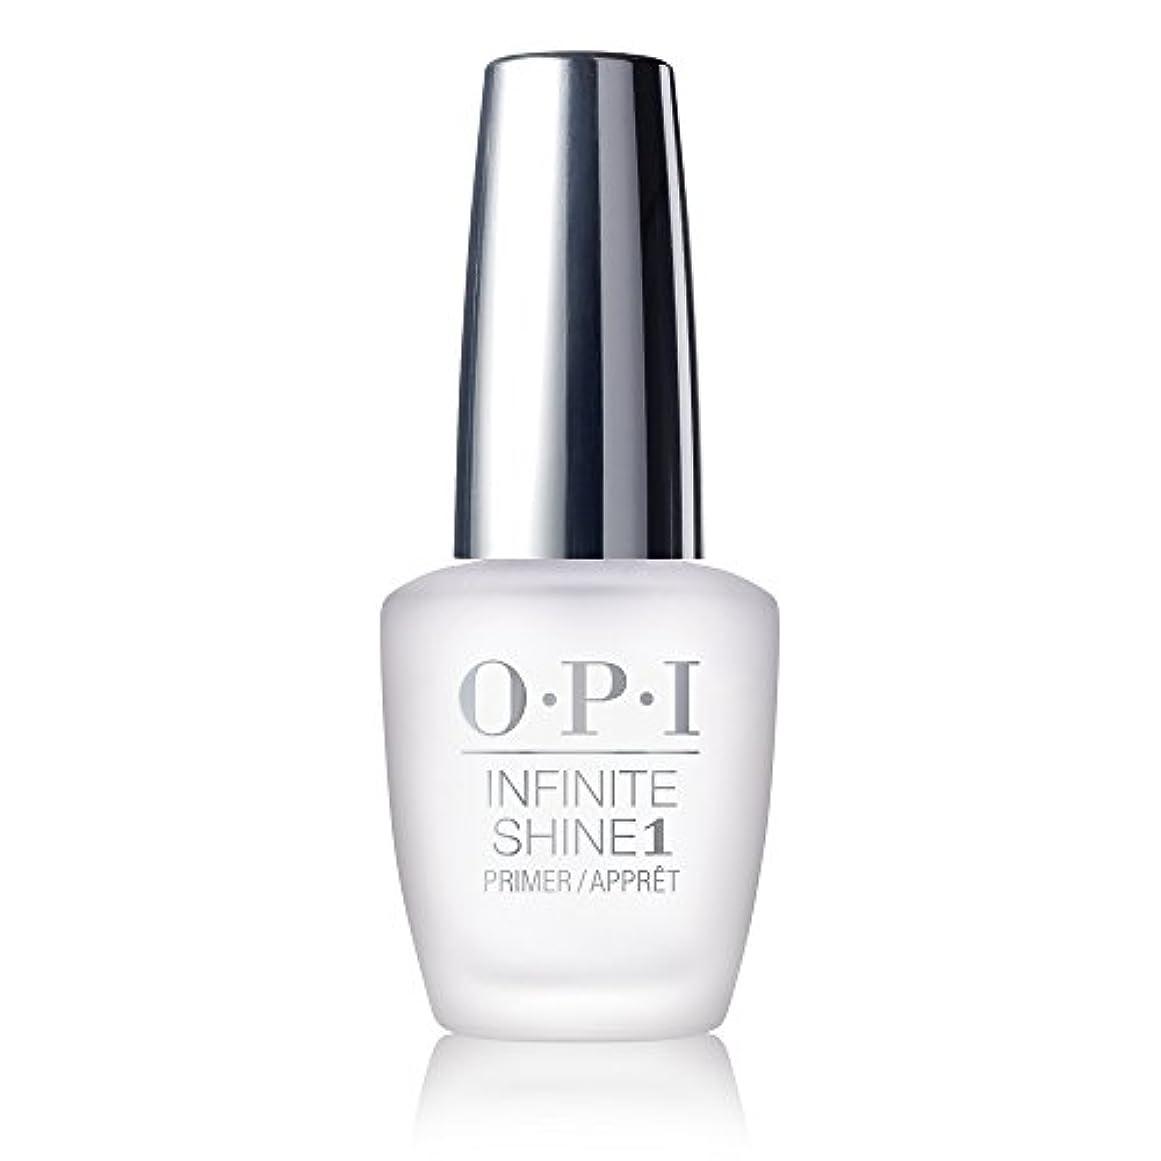 OPI(オーピーアイ) インフィニット シャイン プロステイ プライマー ベースコート